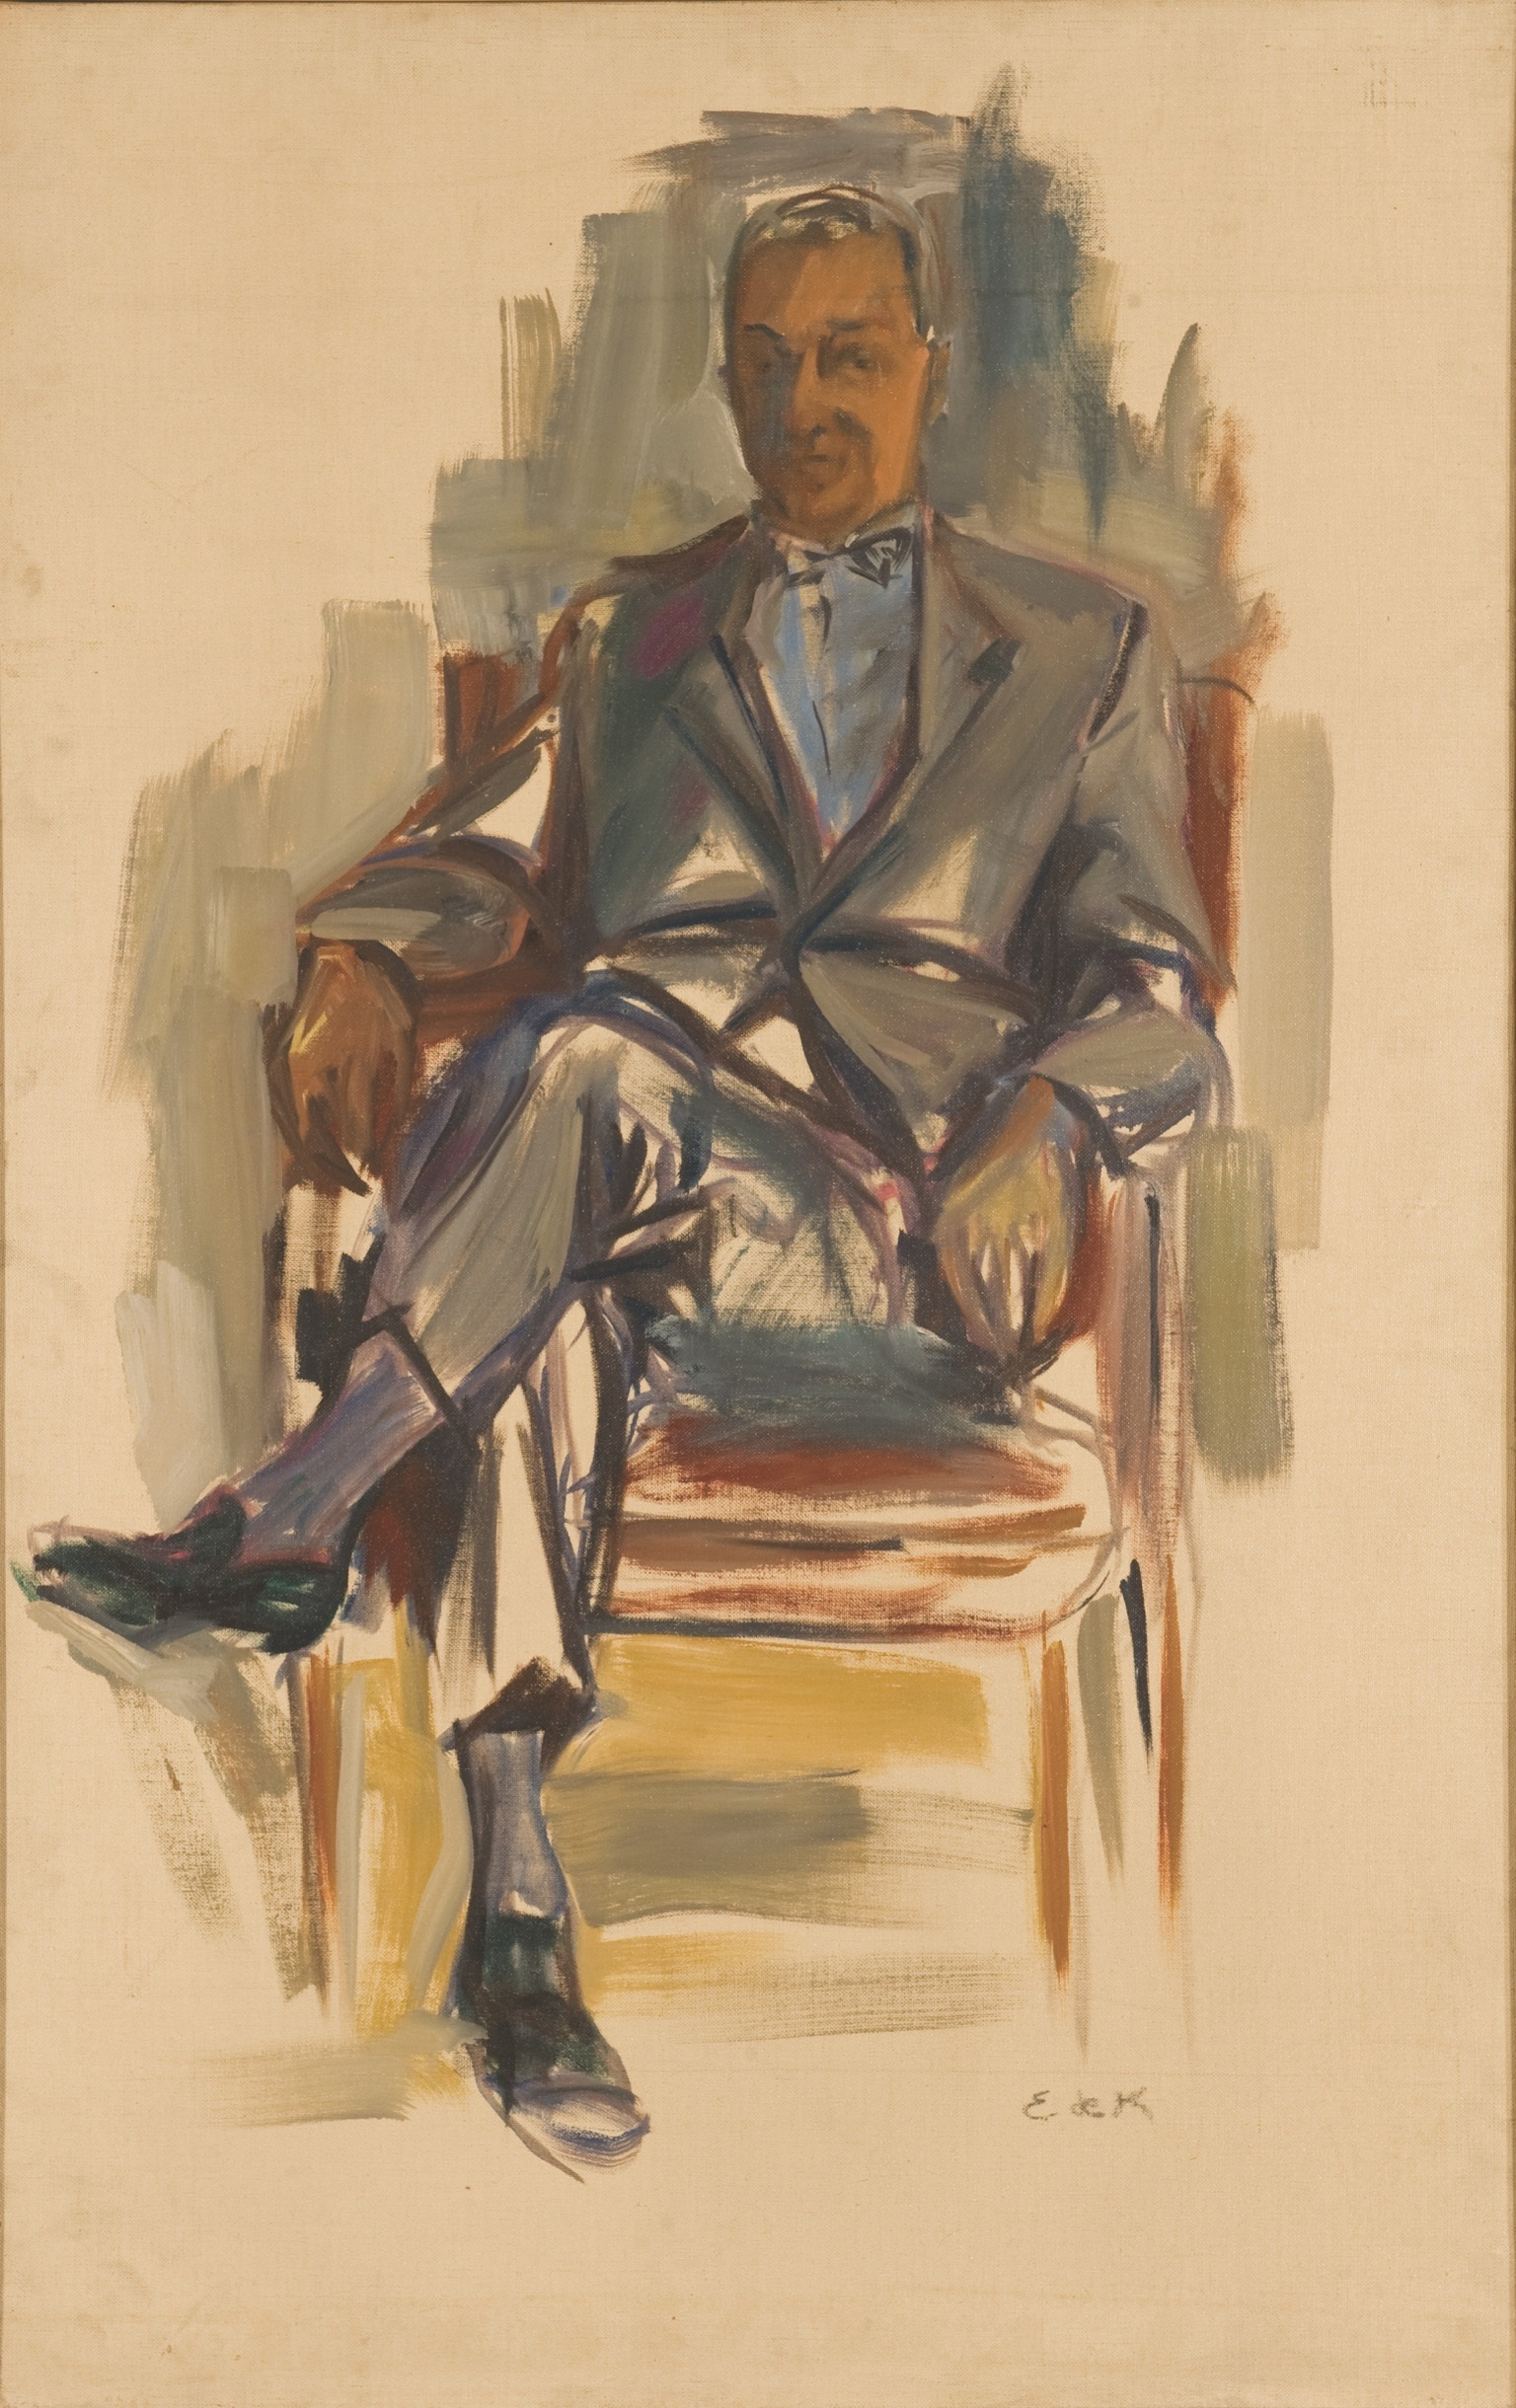 Portrait of Joseph Hirshhorn , ca. 1952, oil on canvas, 44 x 28 inches, Levis Fine Art